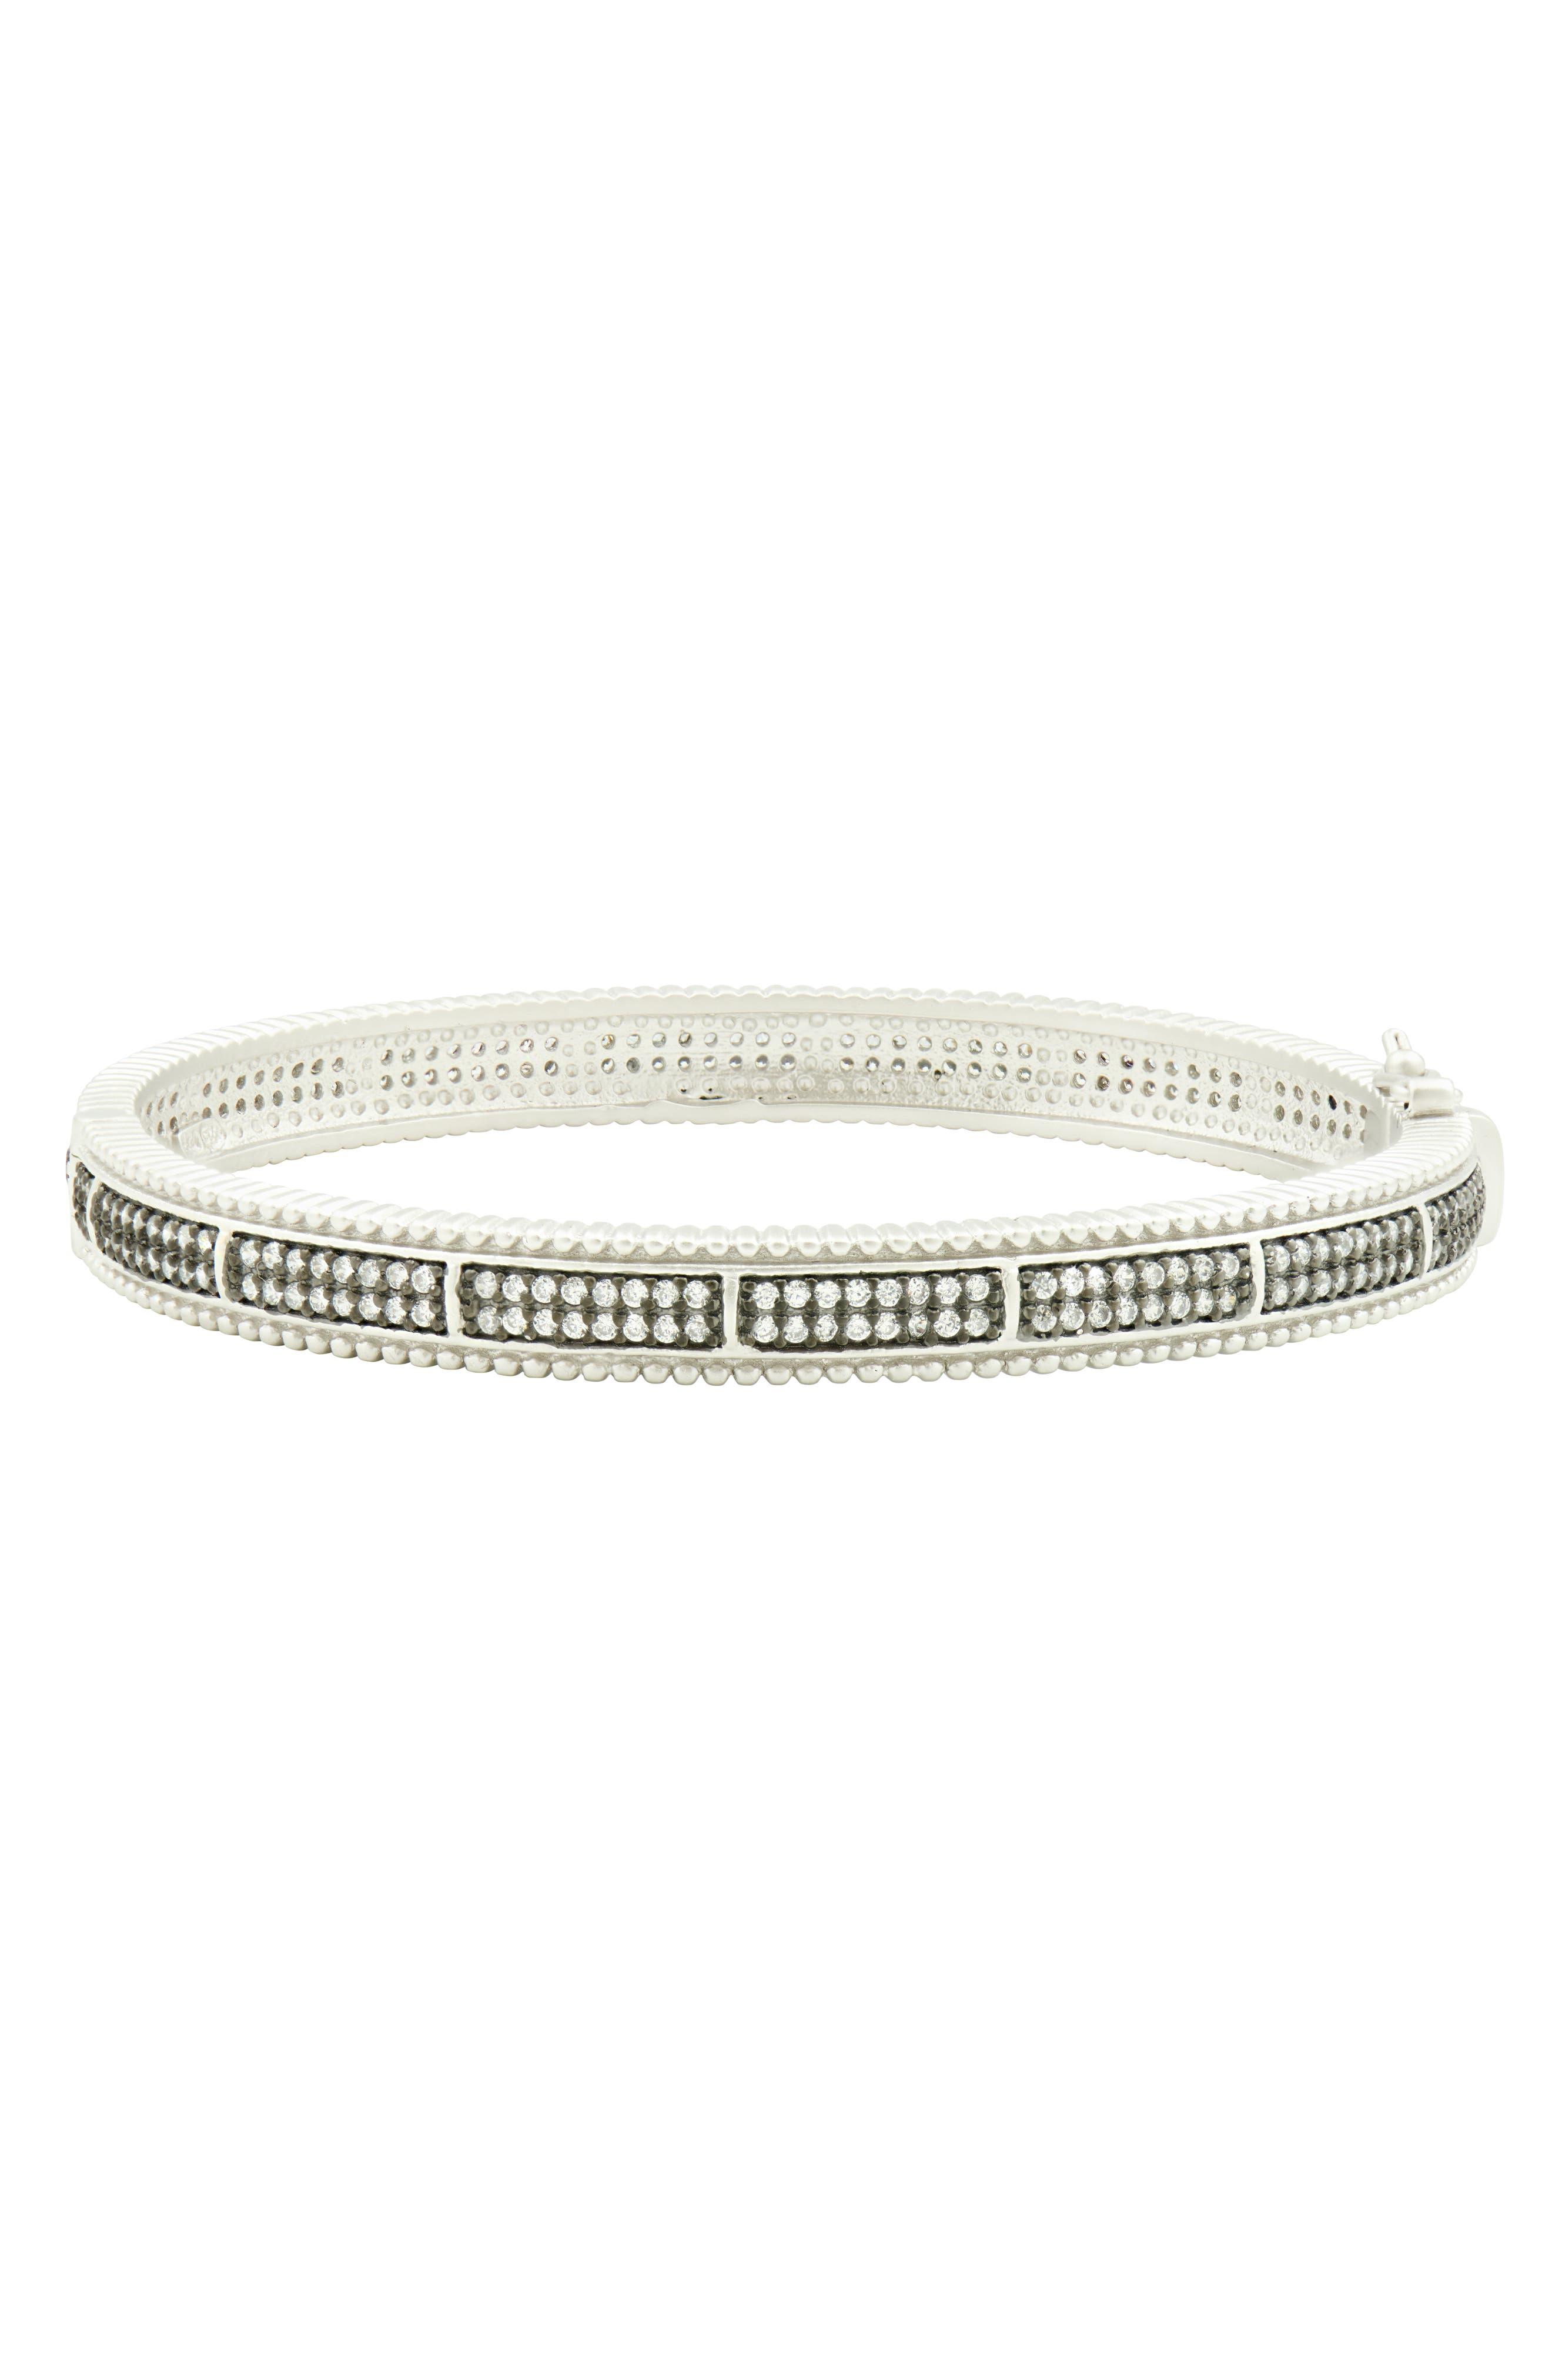 Pavé Hinge Bangle Bracelet,                         Main,                         color, BLACK/ WHITE/ SILVER